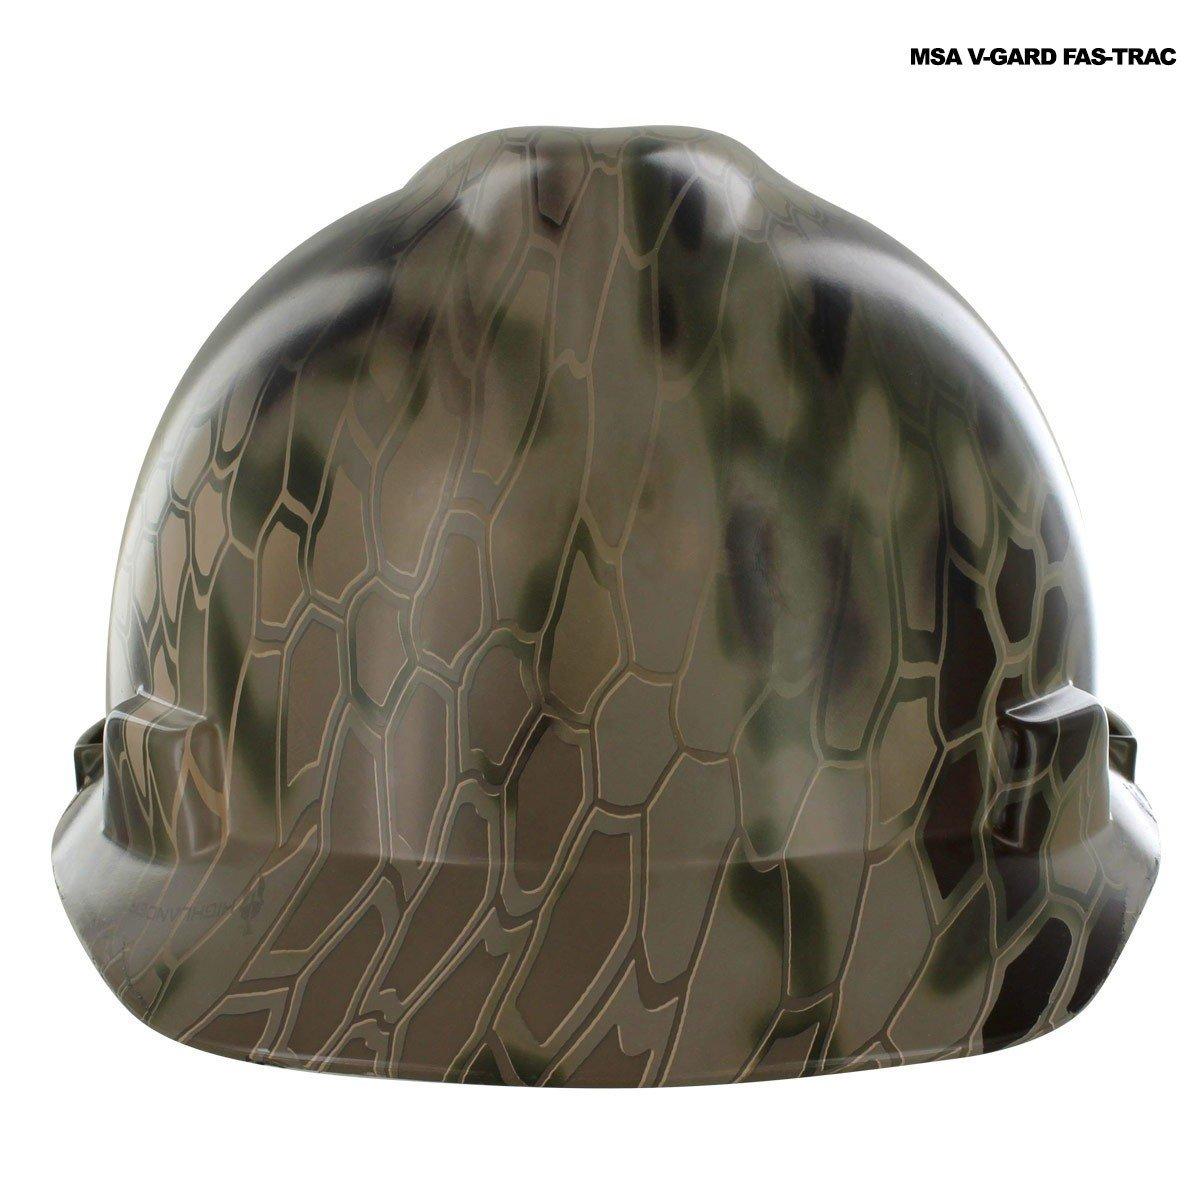 Rugged Blue Hydrographic Kryptek Highlander Hard Hat in MSA V-Gard Fas-Trac Cap - OSSG-CSGSCHH1000036038-VGardFasTrac